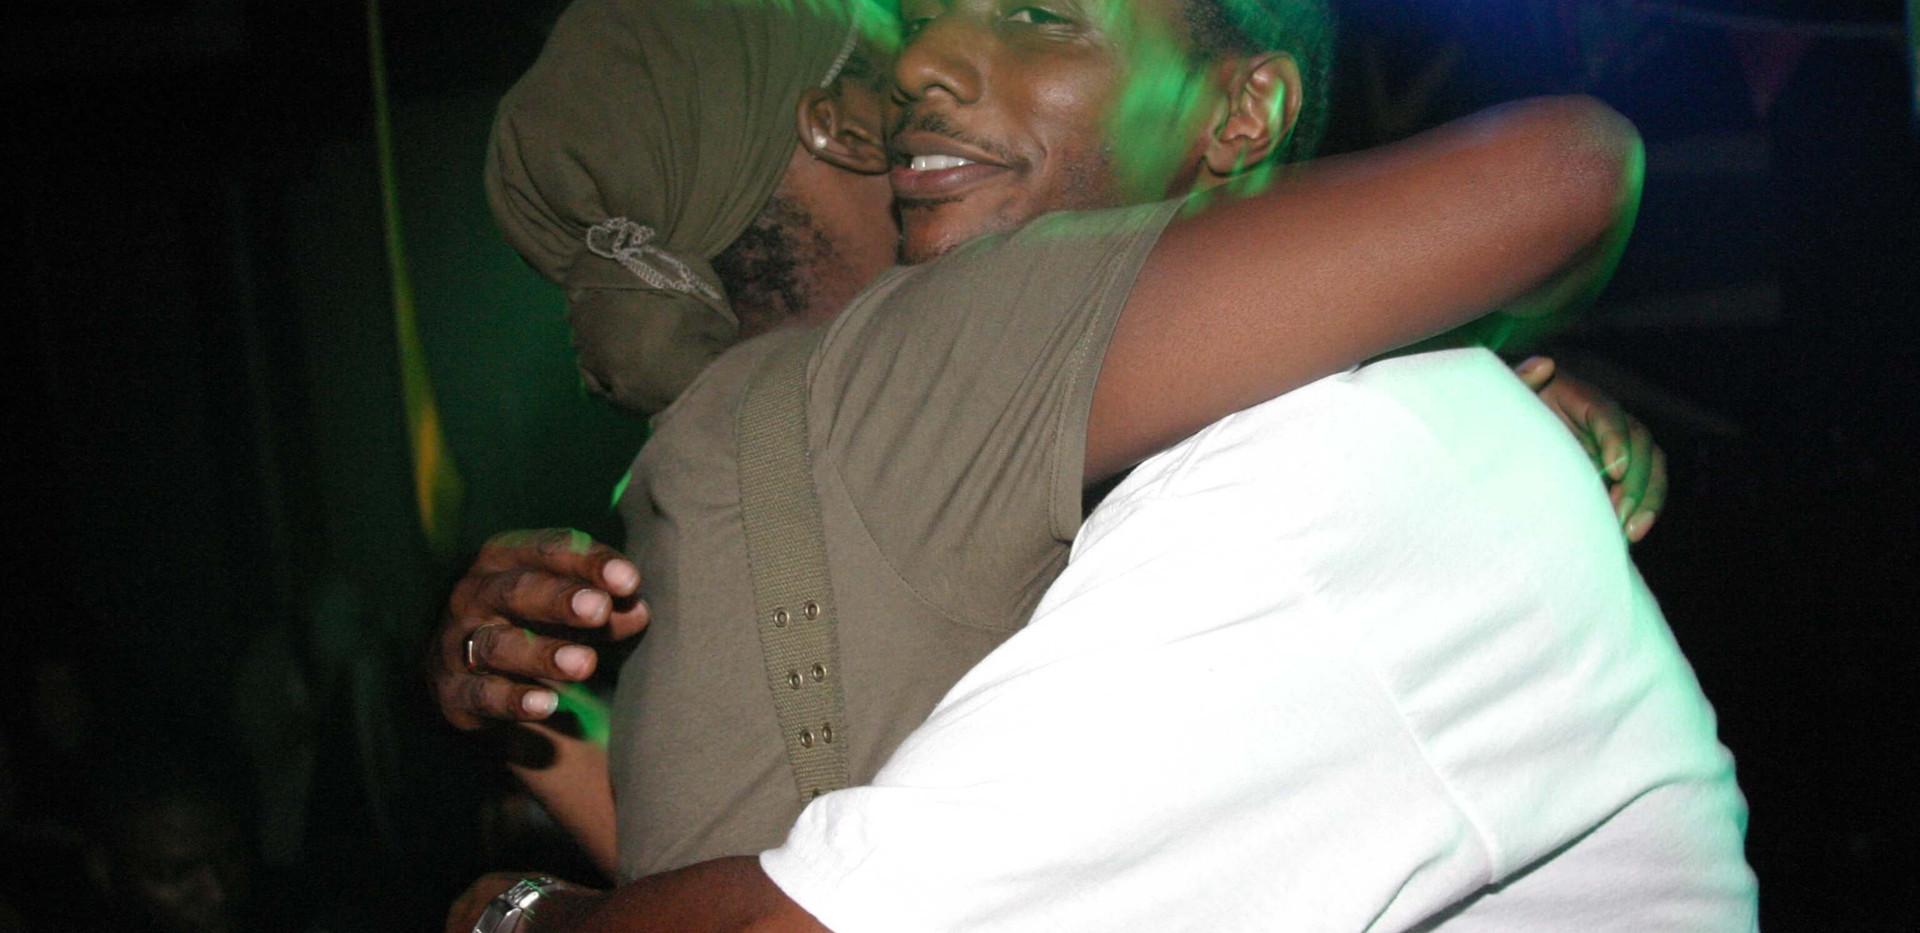 Seanie T huggibg Hill St Soul